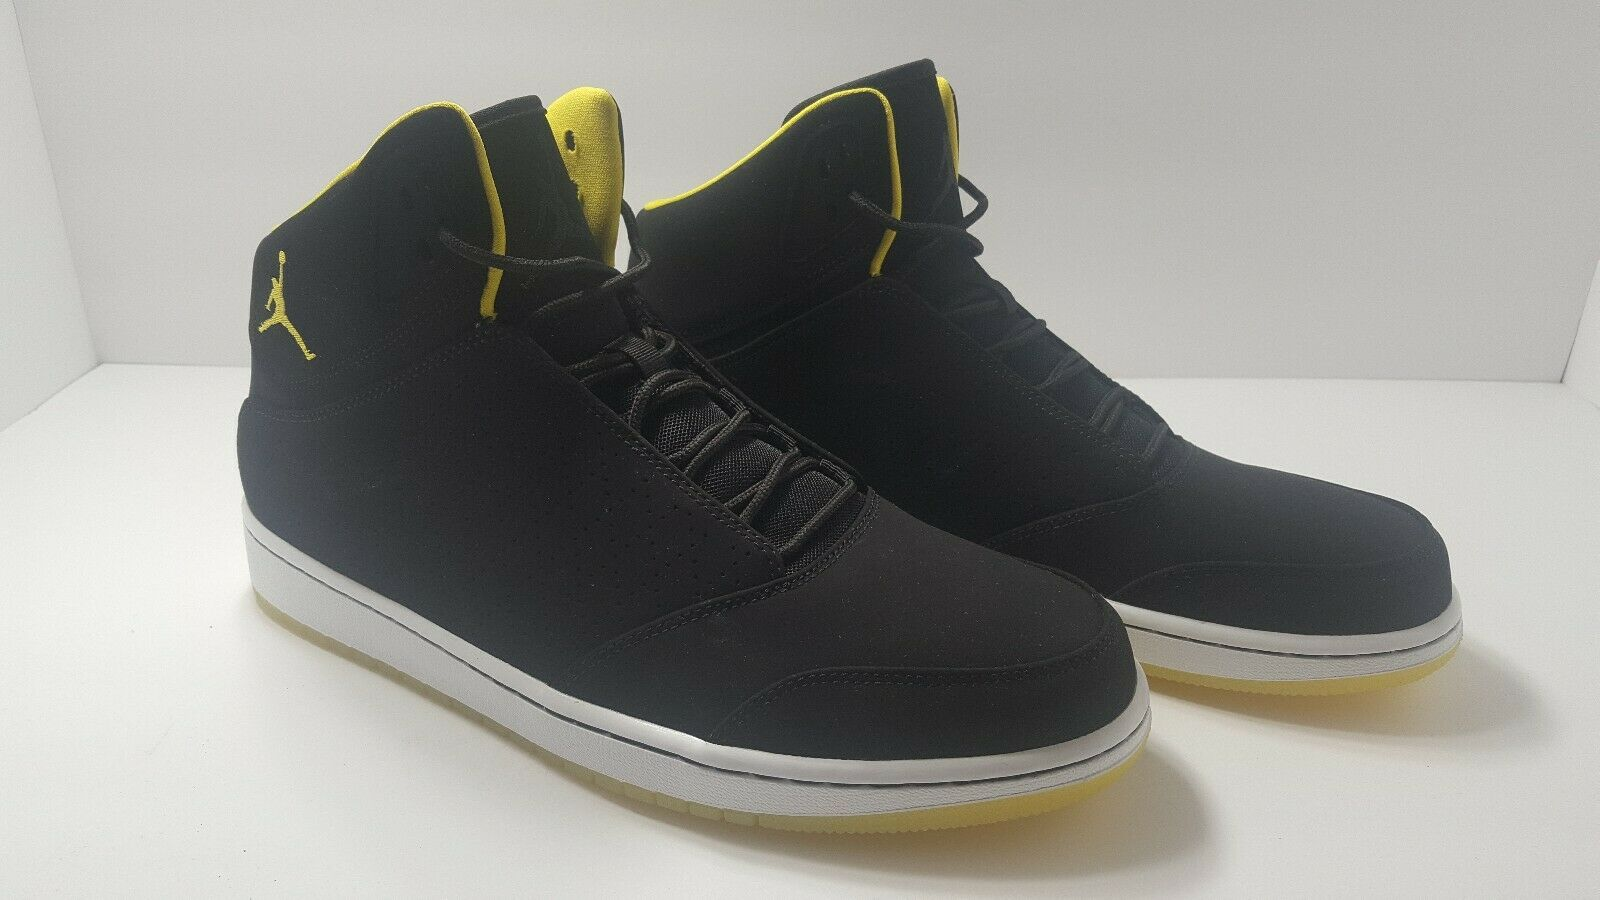 New Nike Jordan 1 Flight 5 Premium Basketball Black Yellow 881434-031 Size 12